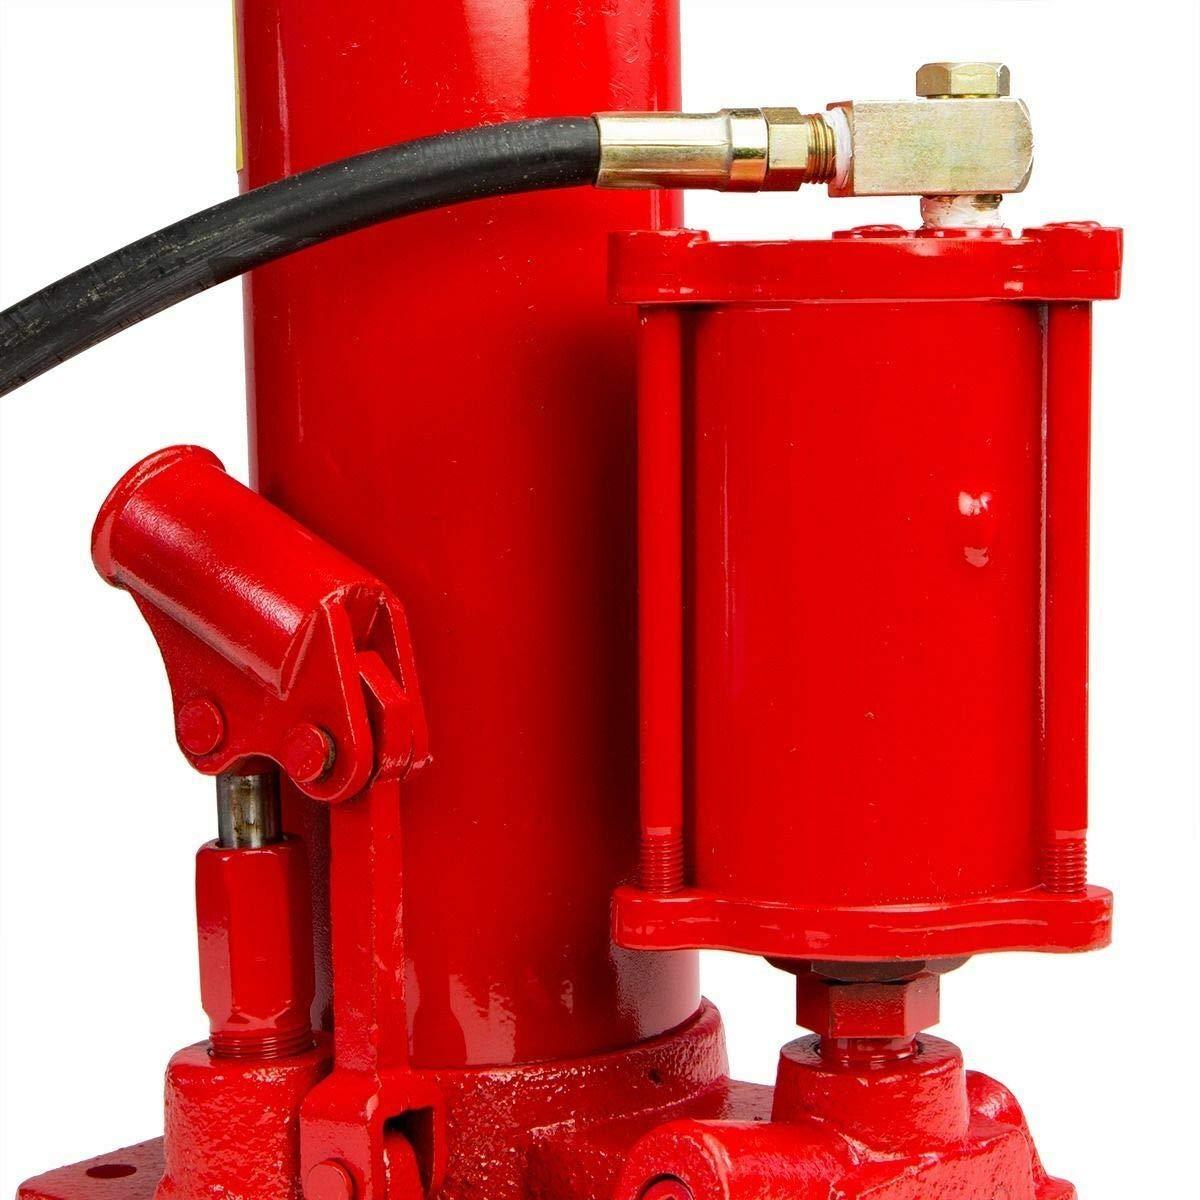 Stroke for Large Lifting Jobs 2 In1 8 Ton Air Manual Hydraulic Ram Jack Pump Engine Lift Hoist Cherry Picker Versatile Use